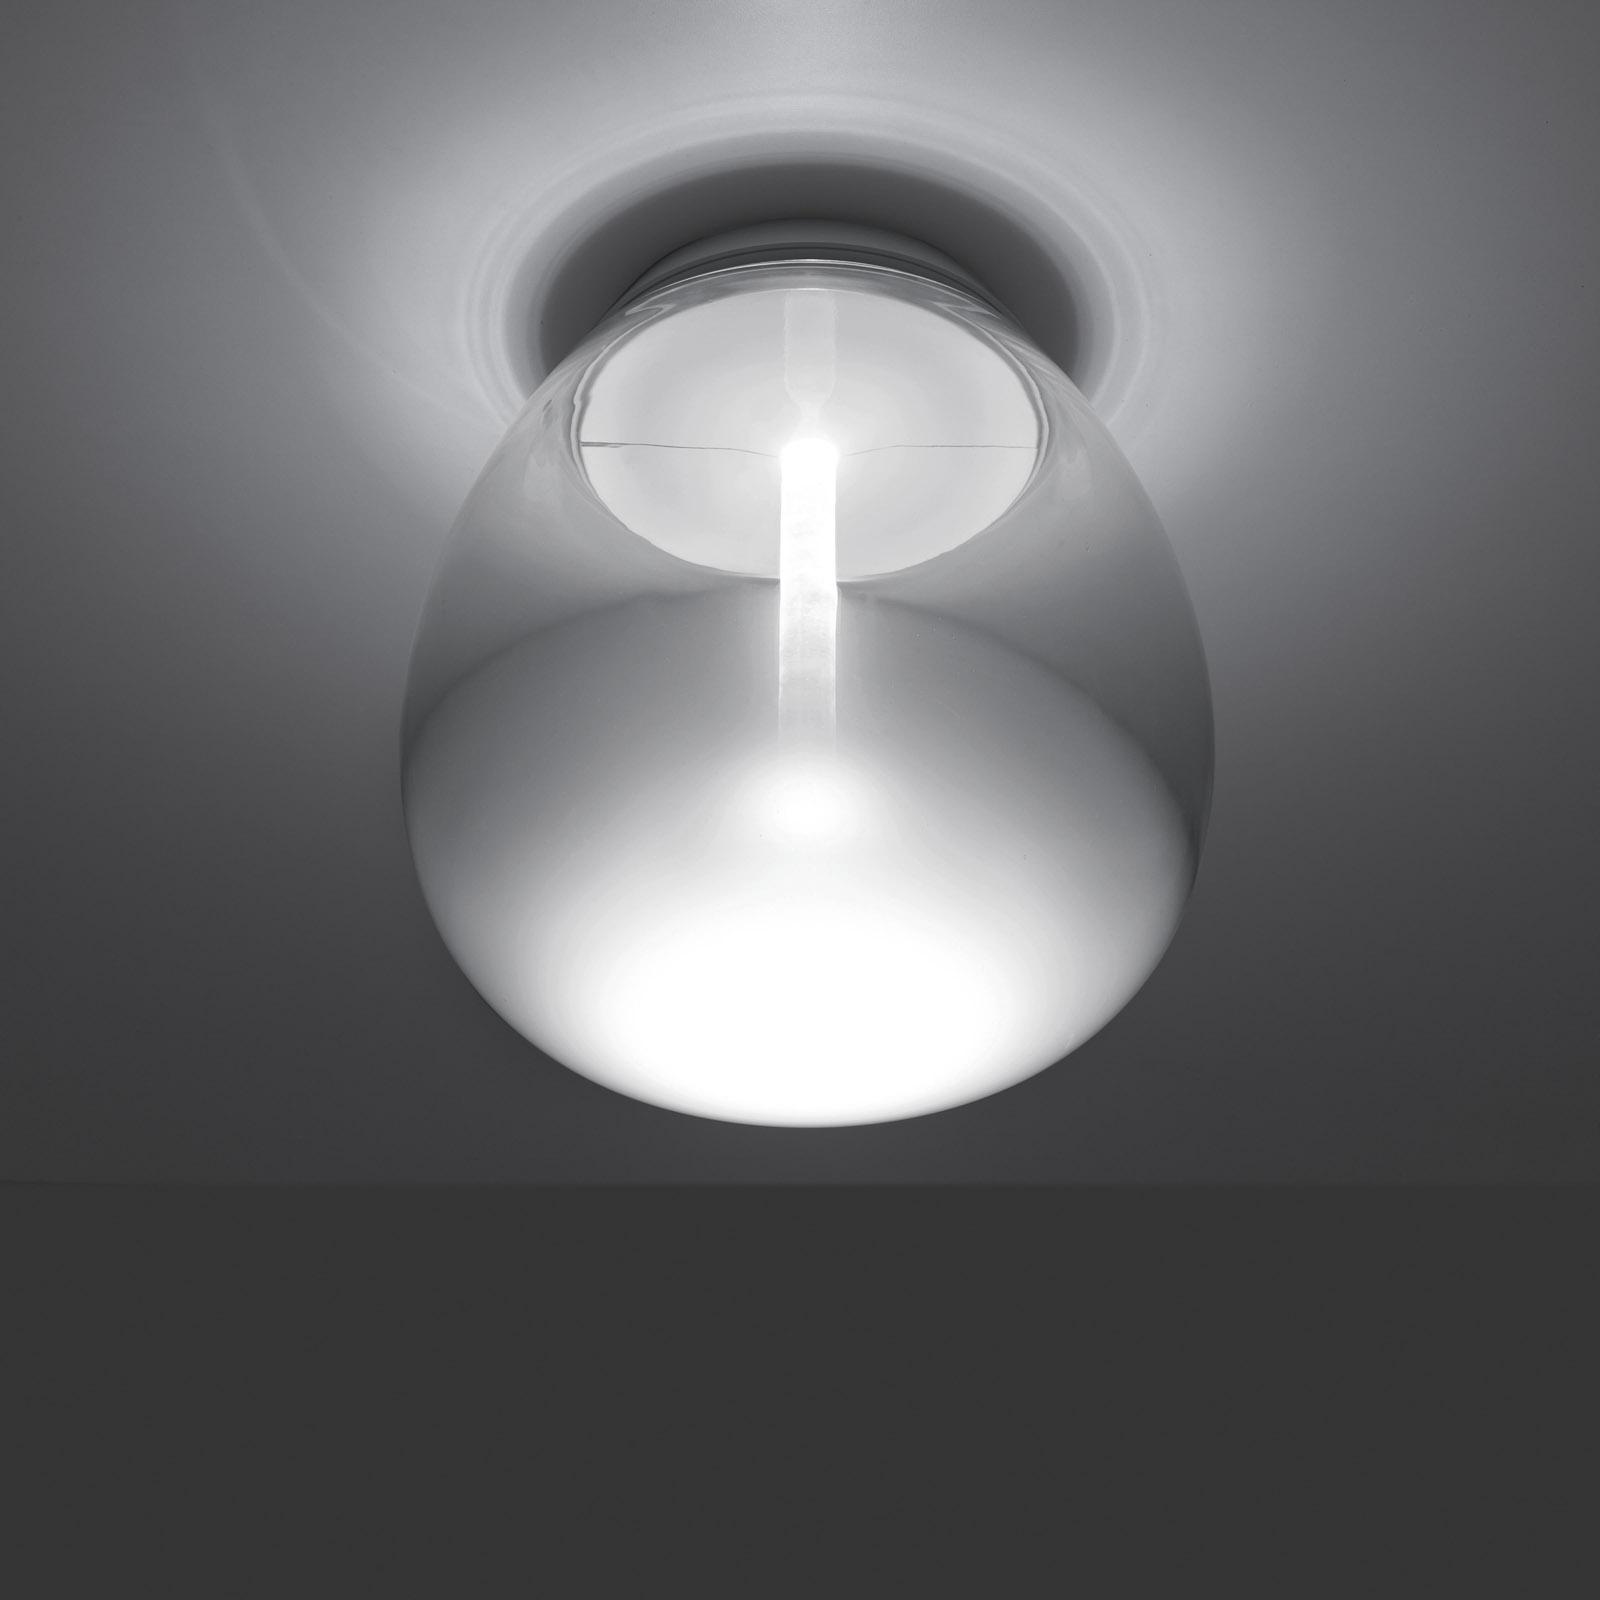 Artemide Empatia -LED-kattovalaisin, Ø 26 cm